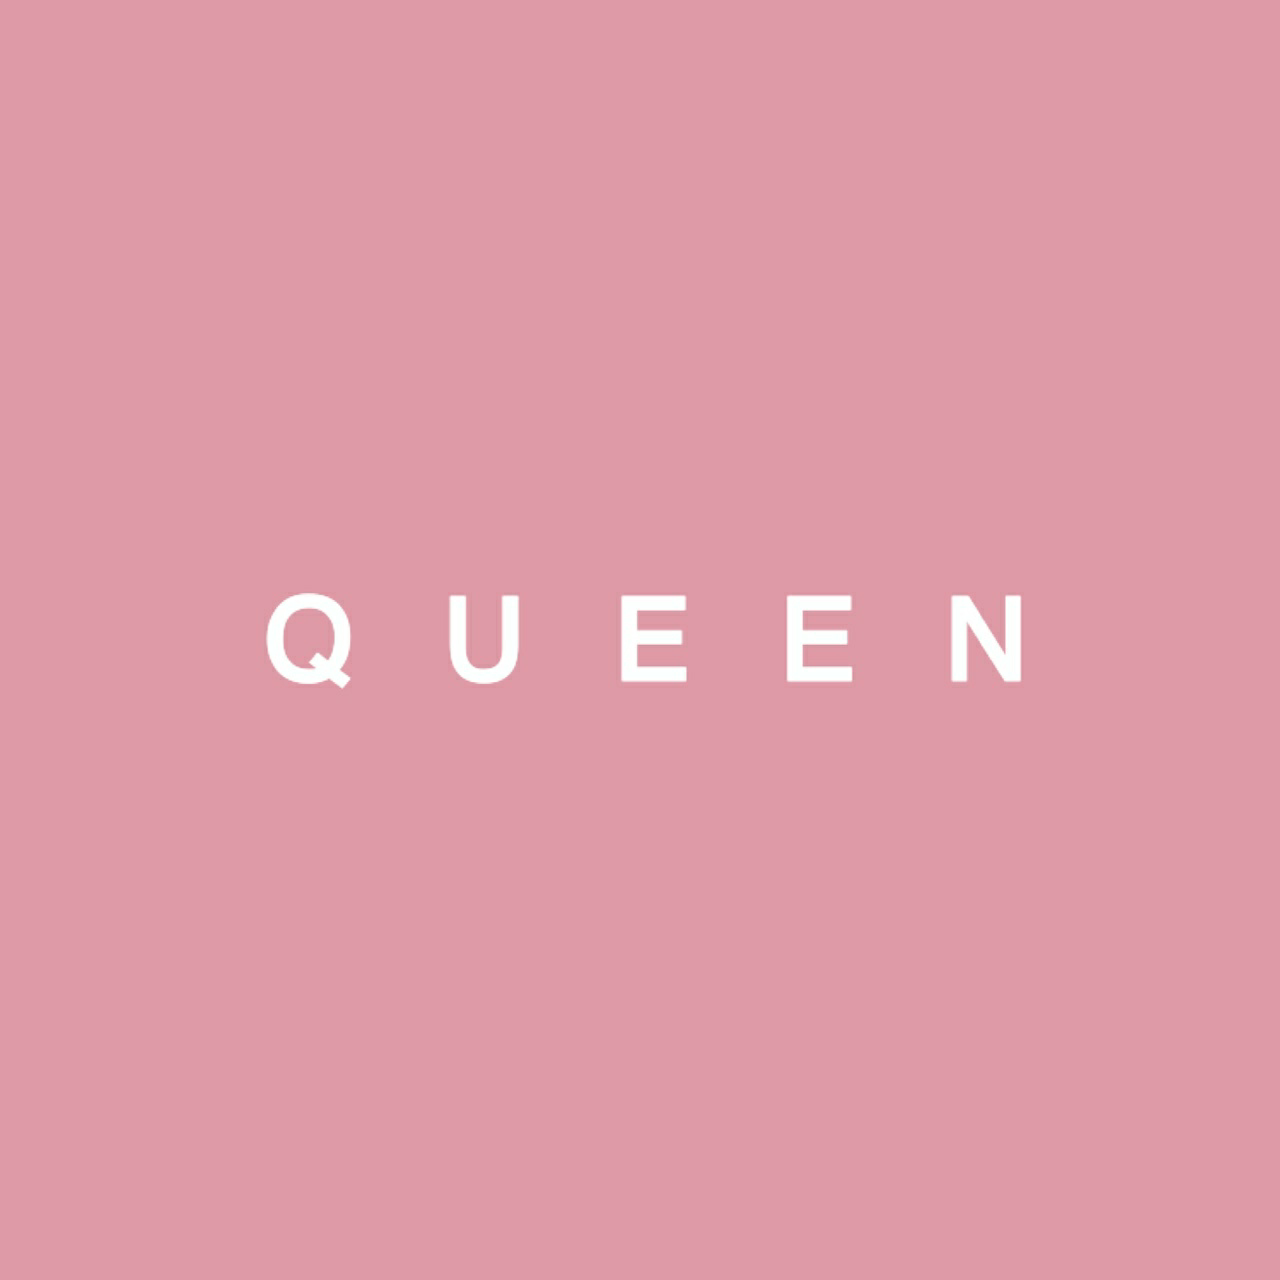 Wallpaper iphone tumblr princess - Arabiianbeautyqueen Http Arabiianbeautyqueen Tumblr Com Ig Shesaglamour